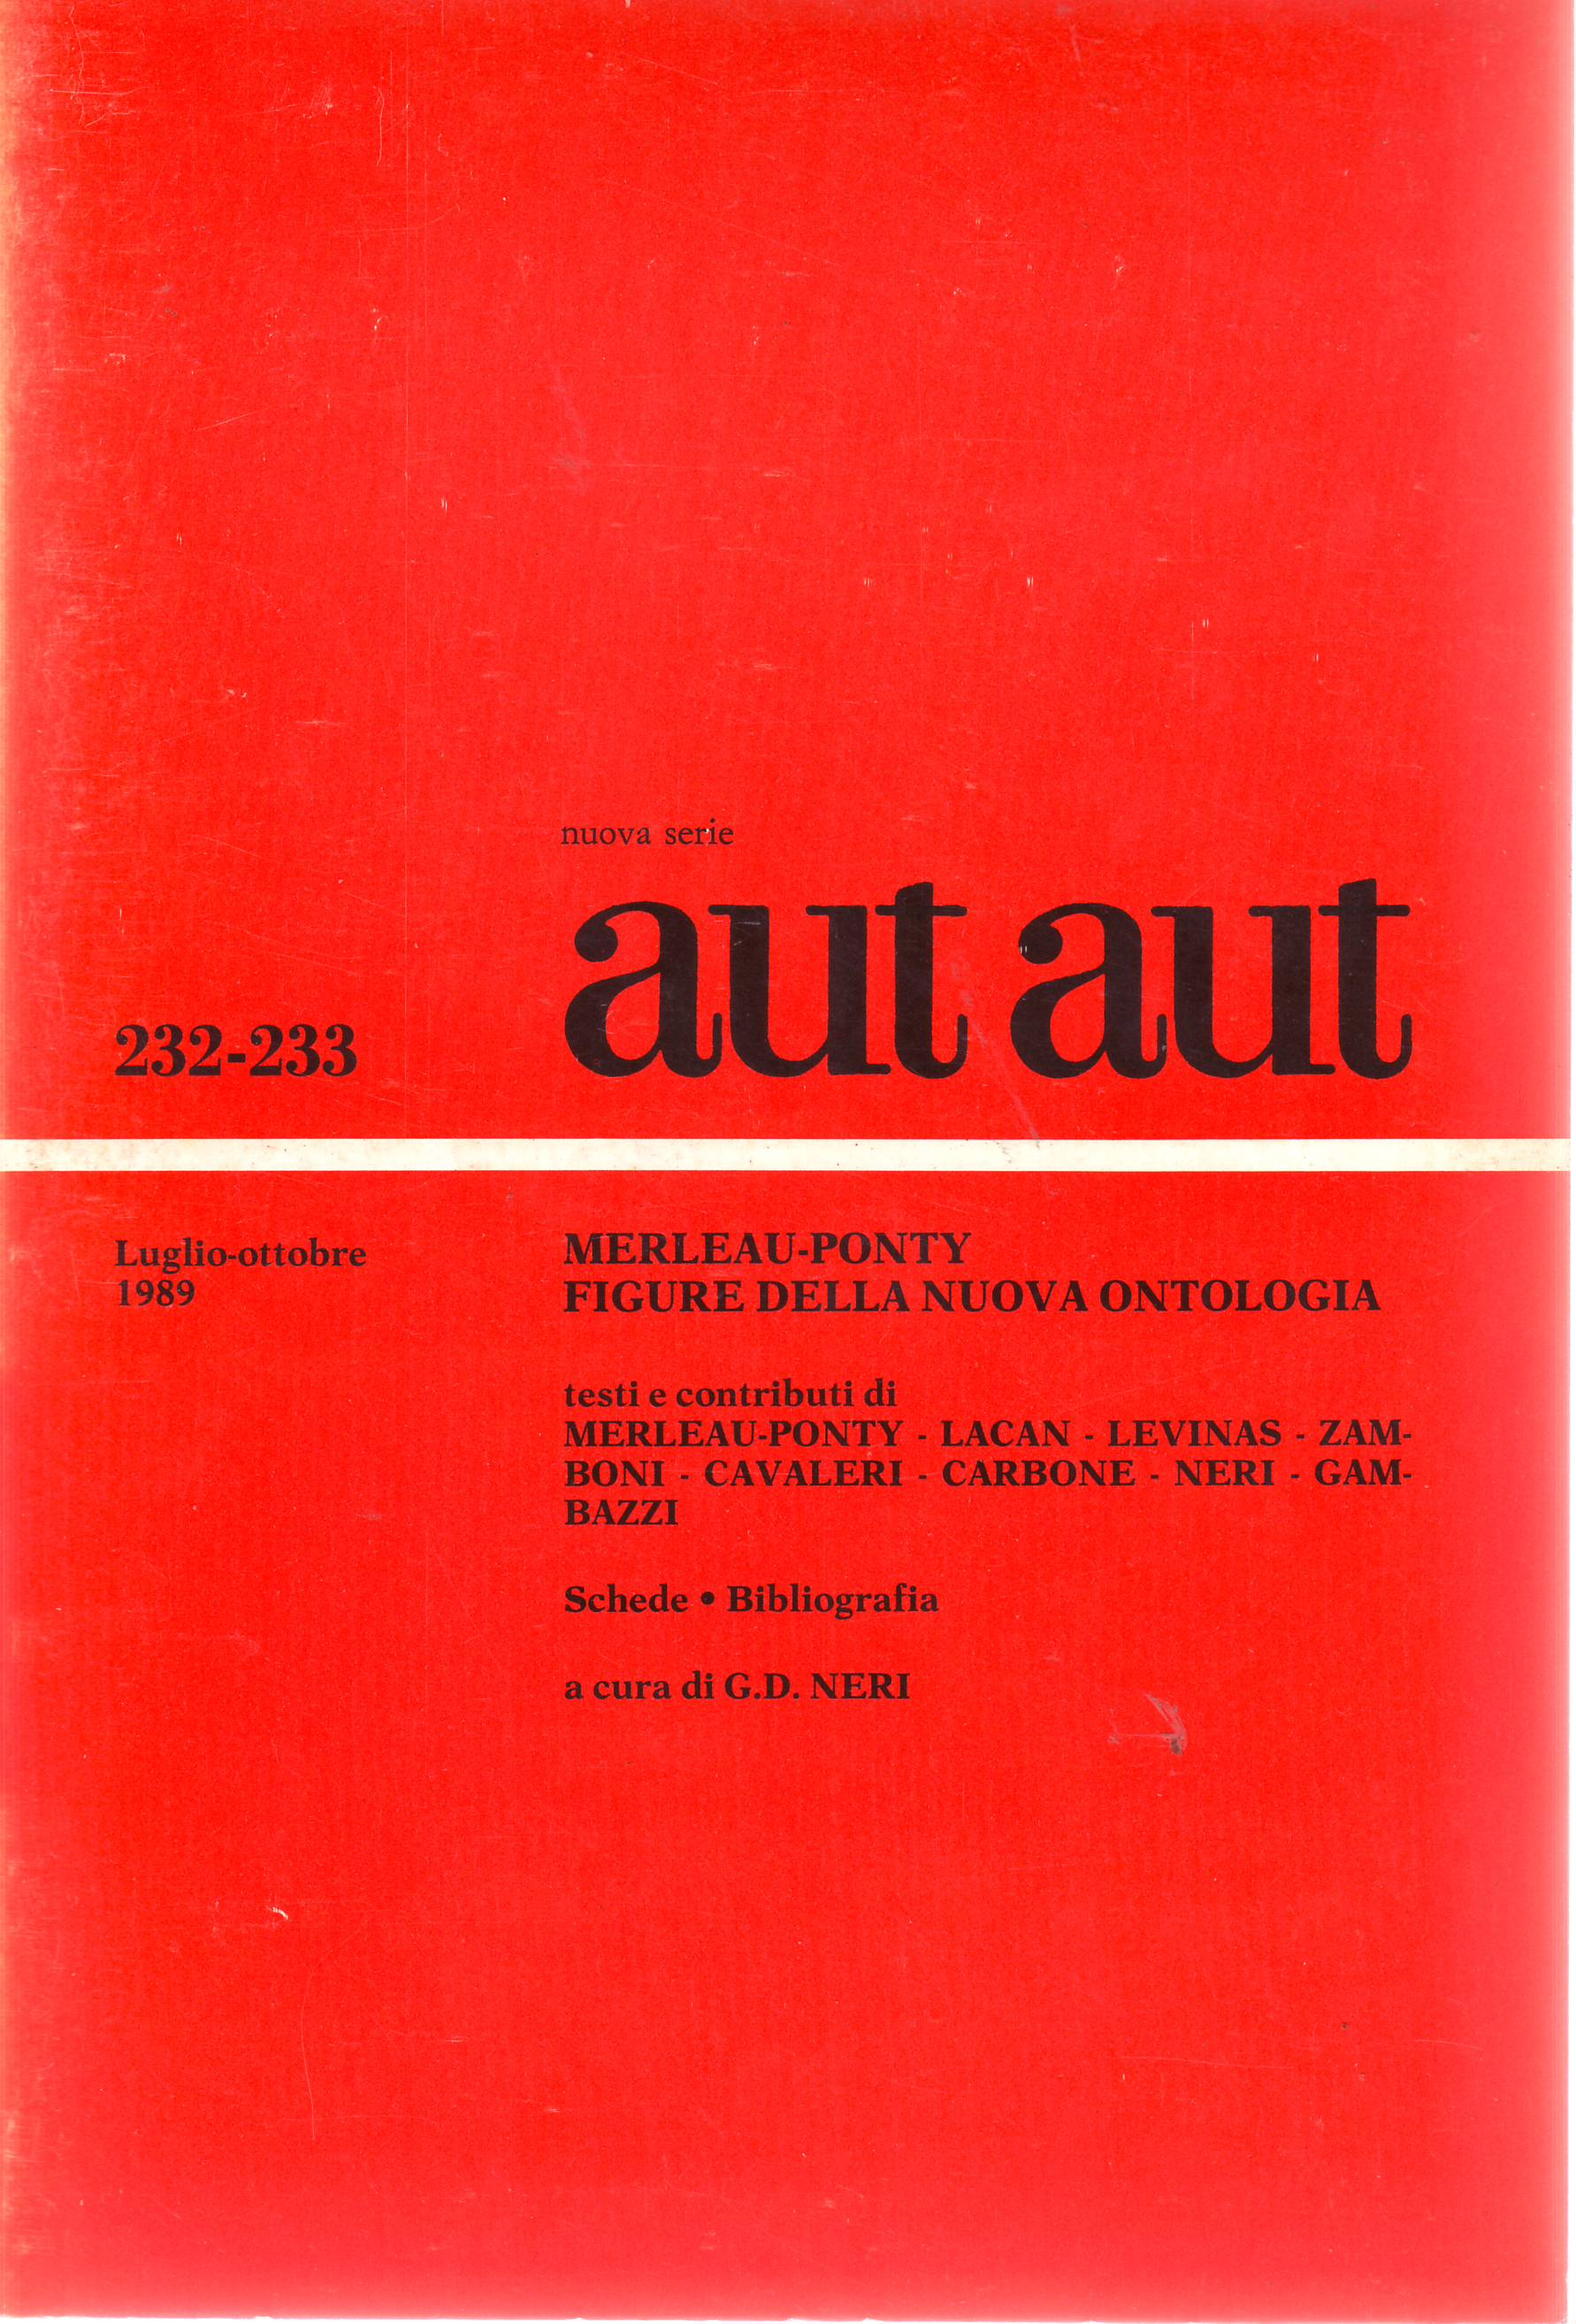 Merleau-Ponty. Figure della nuova ontologia